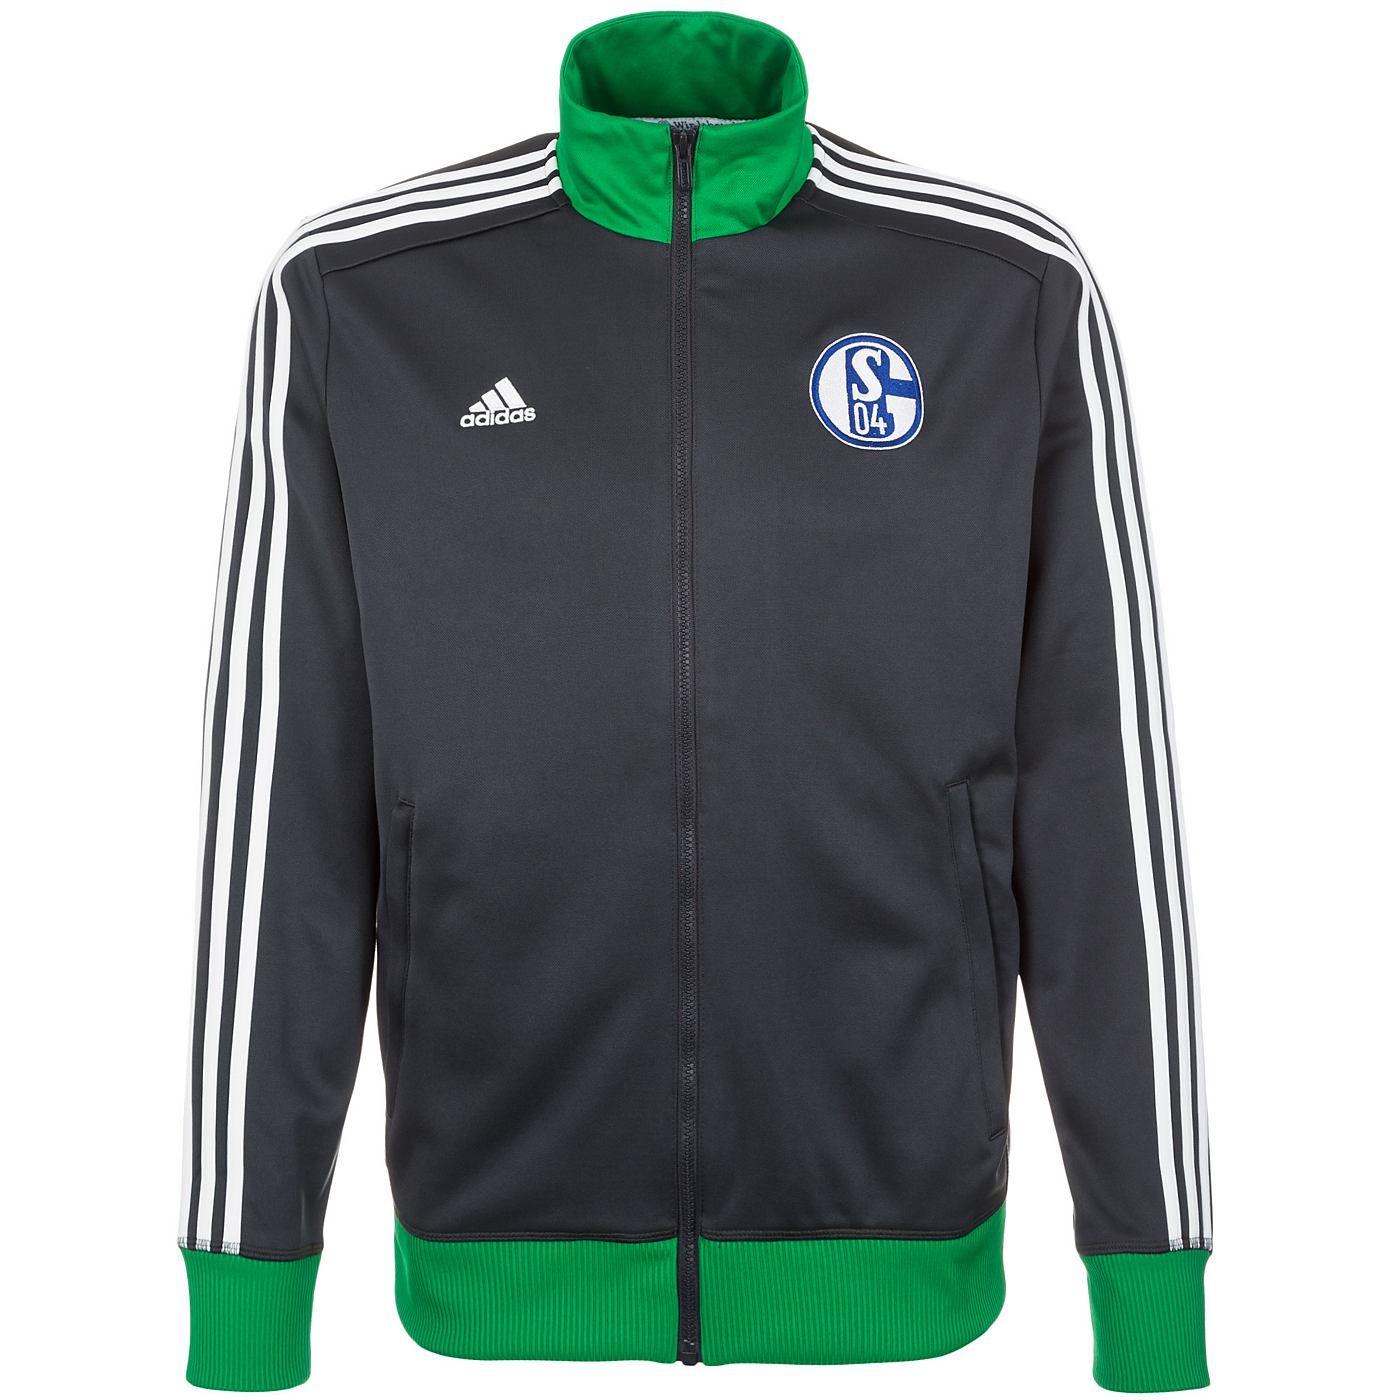 FC SCHALKE 04 Original Adidas Freizeit Trainingsanzug Jacke